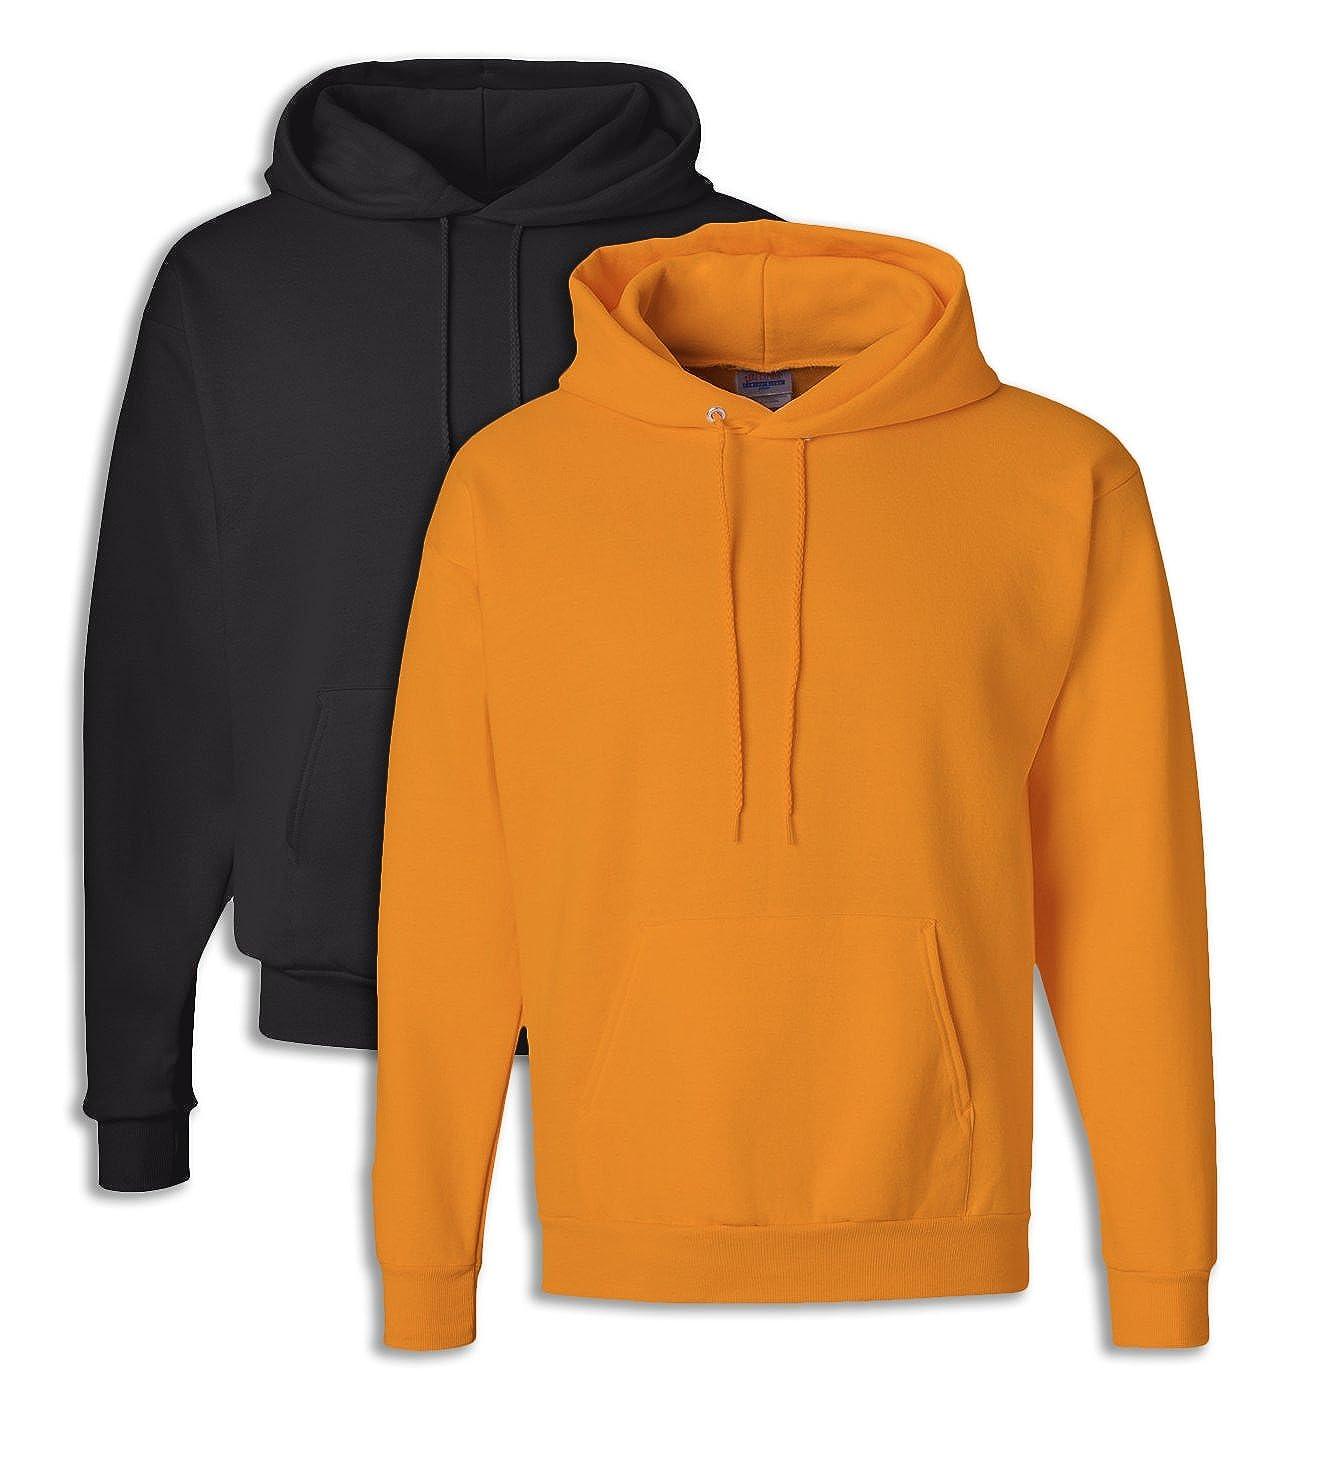 1 Safety Orange Hanes P170 Mens EcoSmart Hooded Sweatshirt XL 1 Black